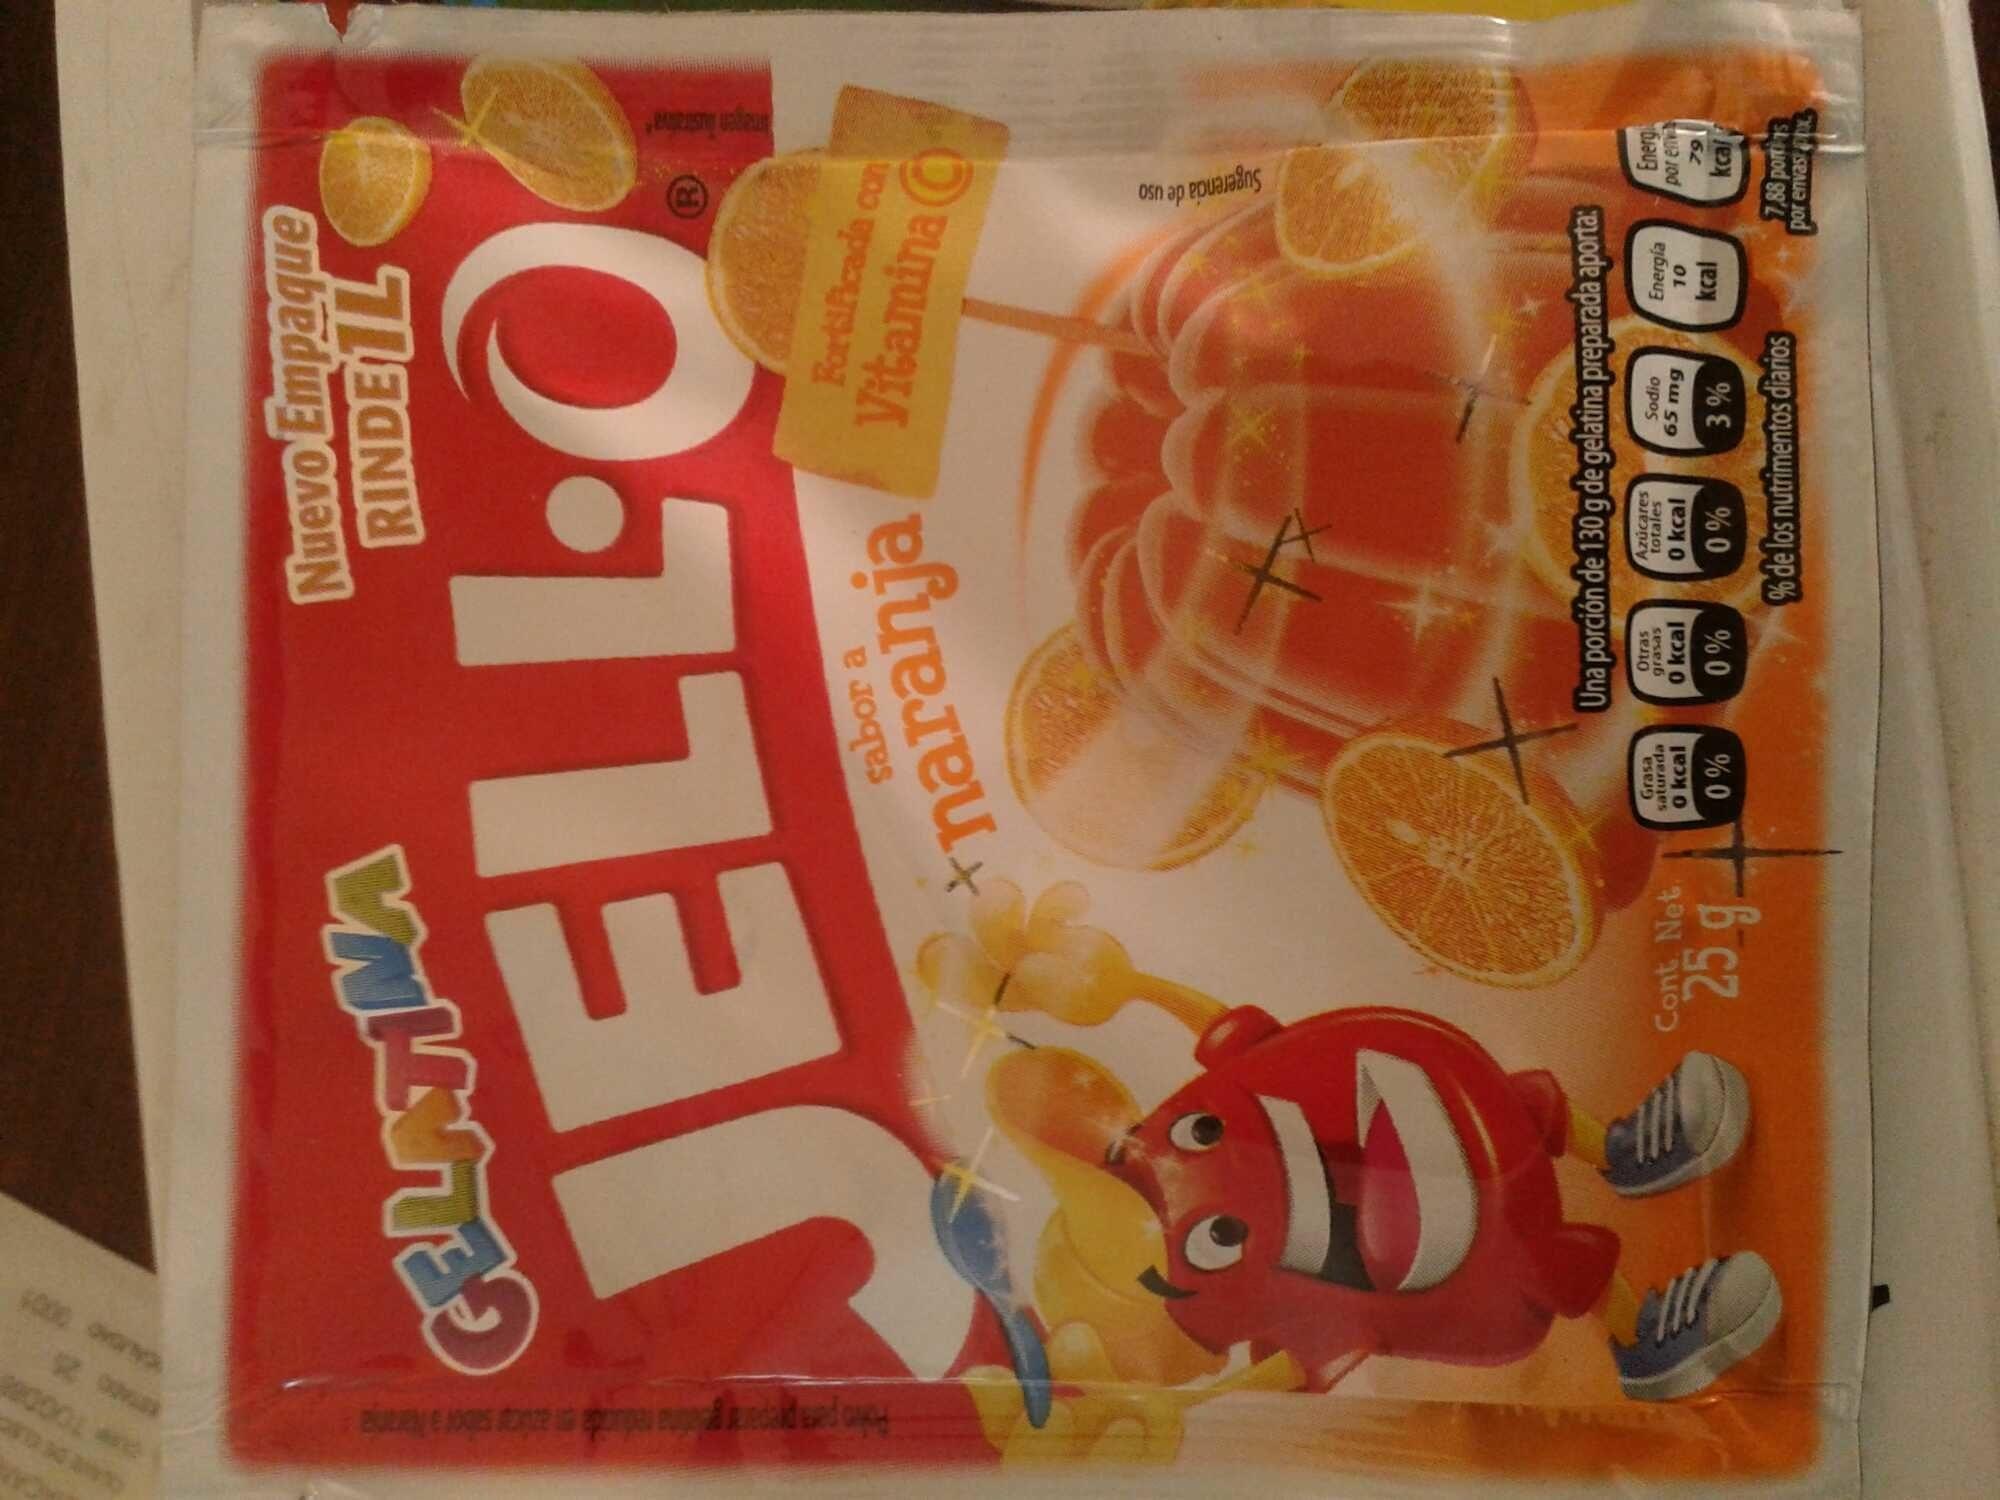 Gelatina Jell-o - Product - es